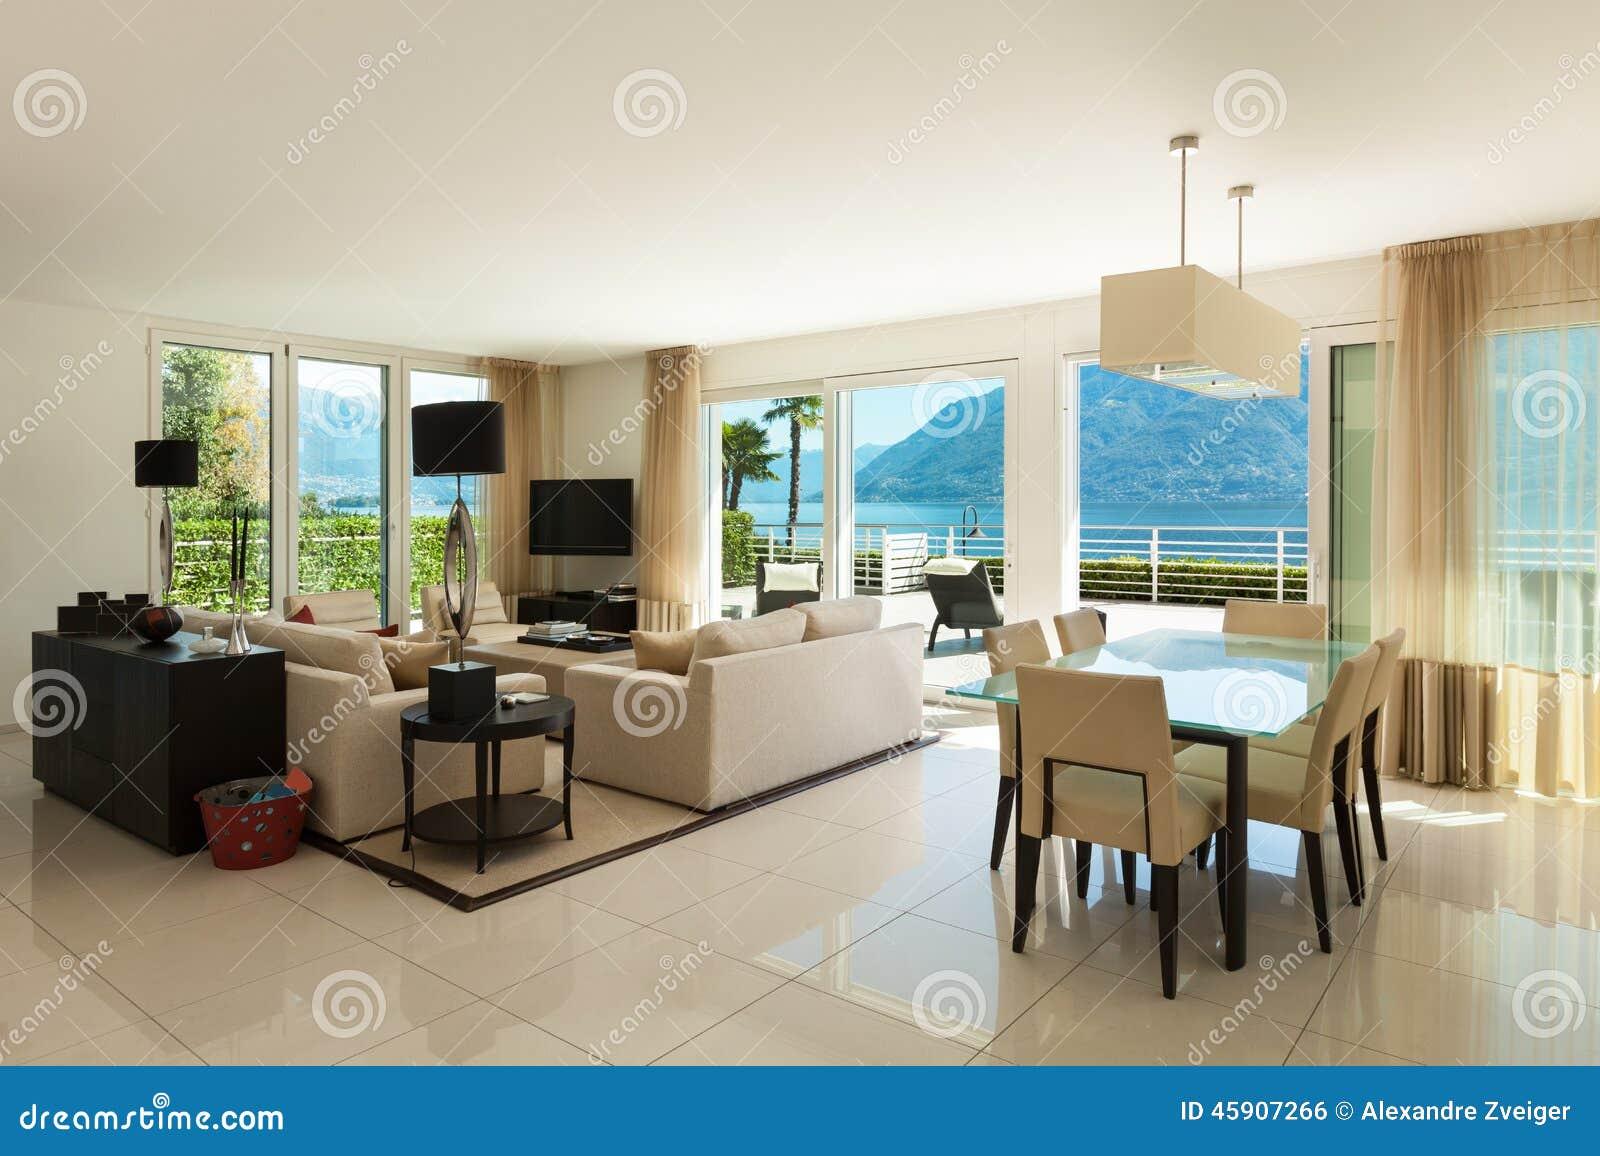 Appartamento interno e moderno